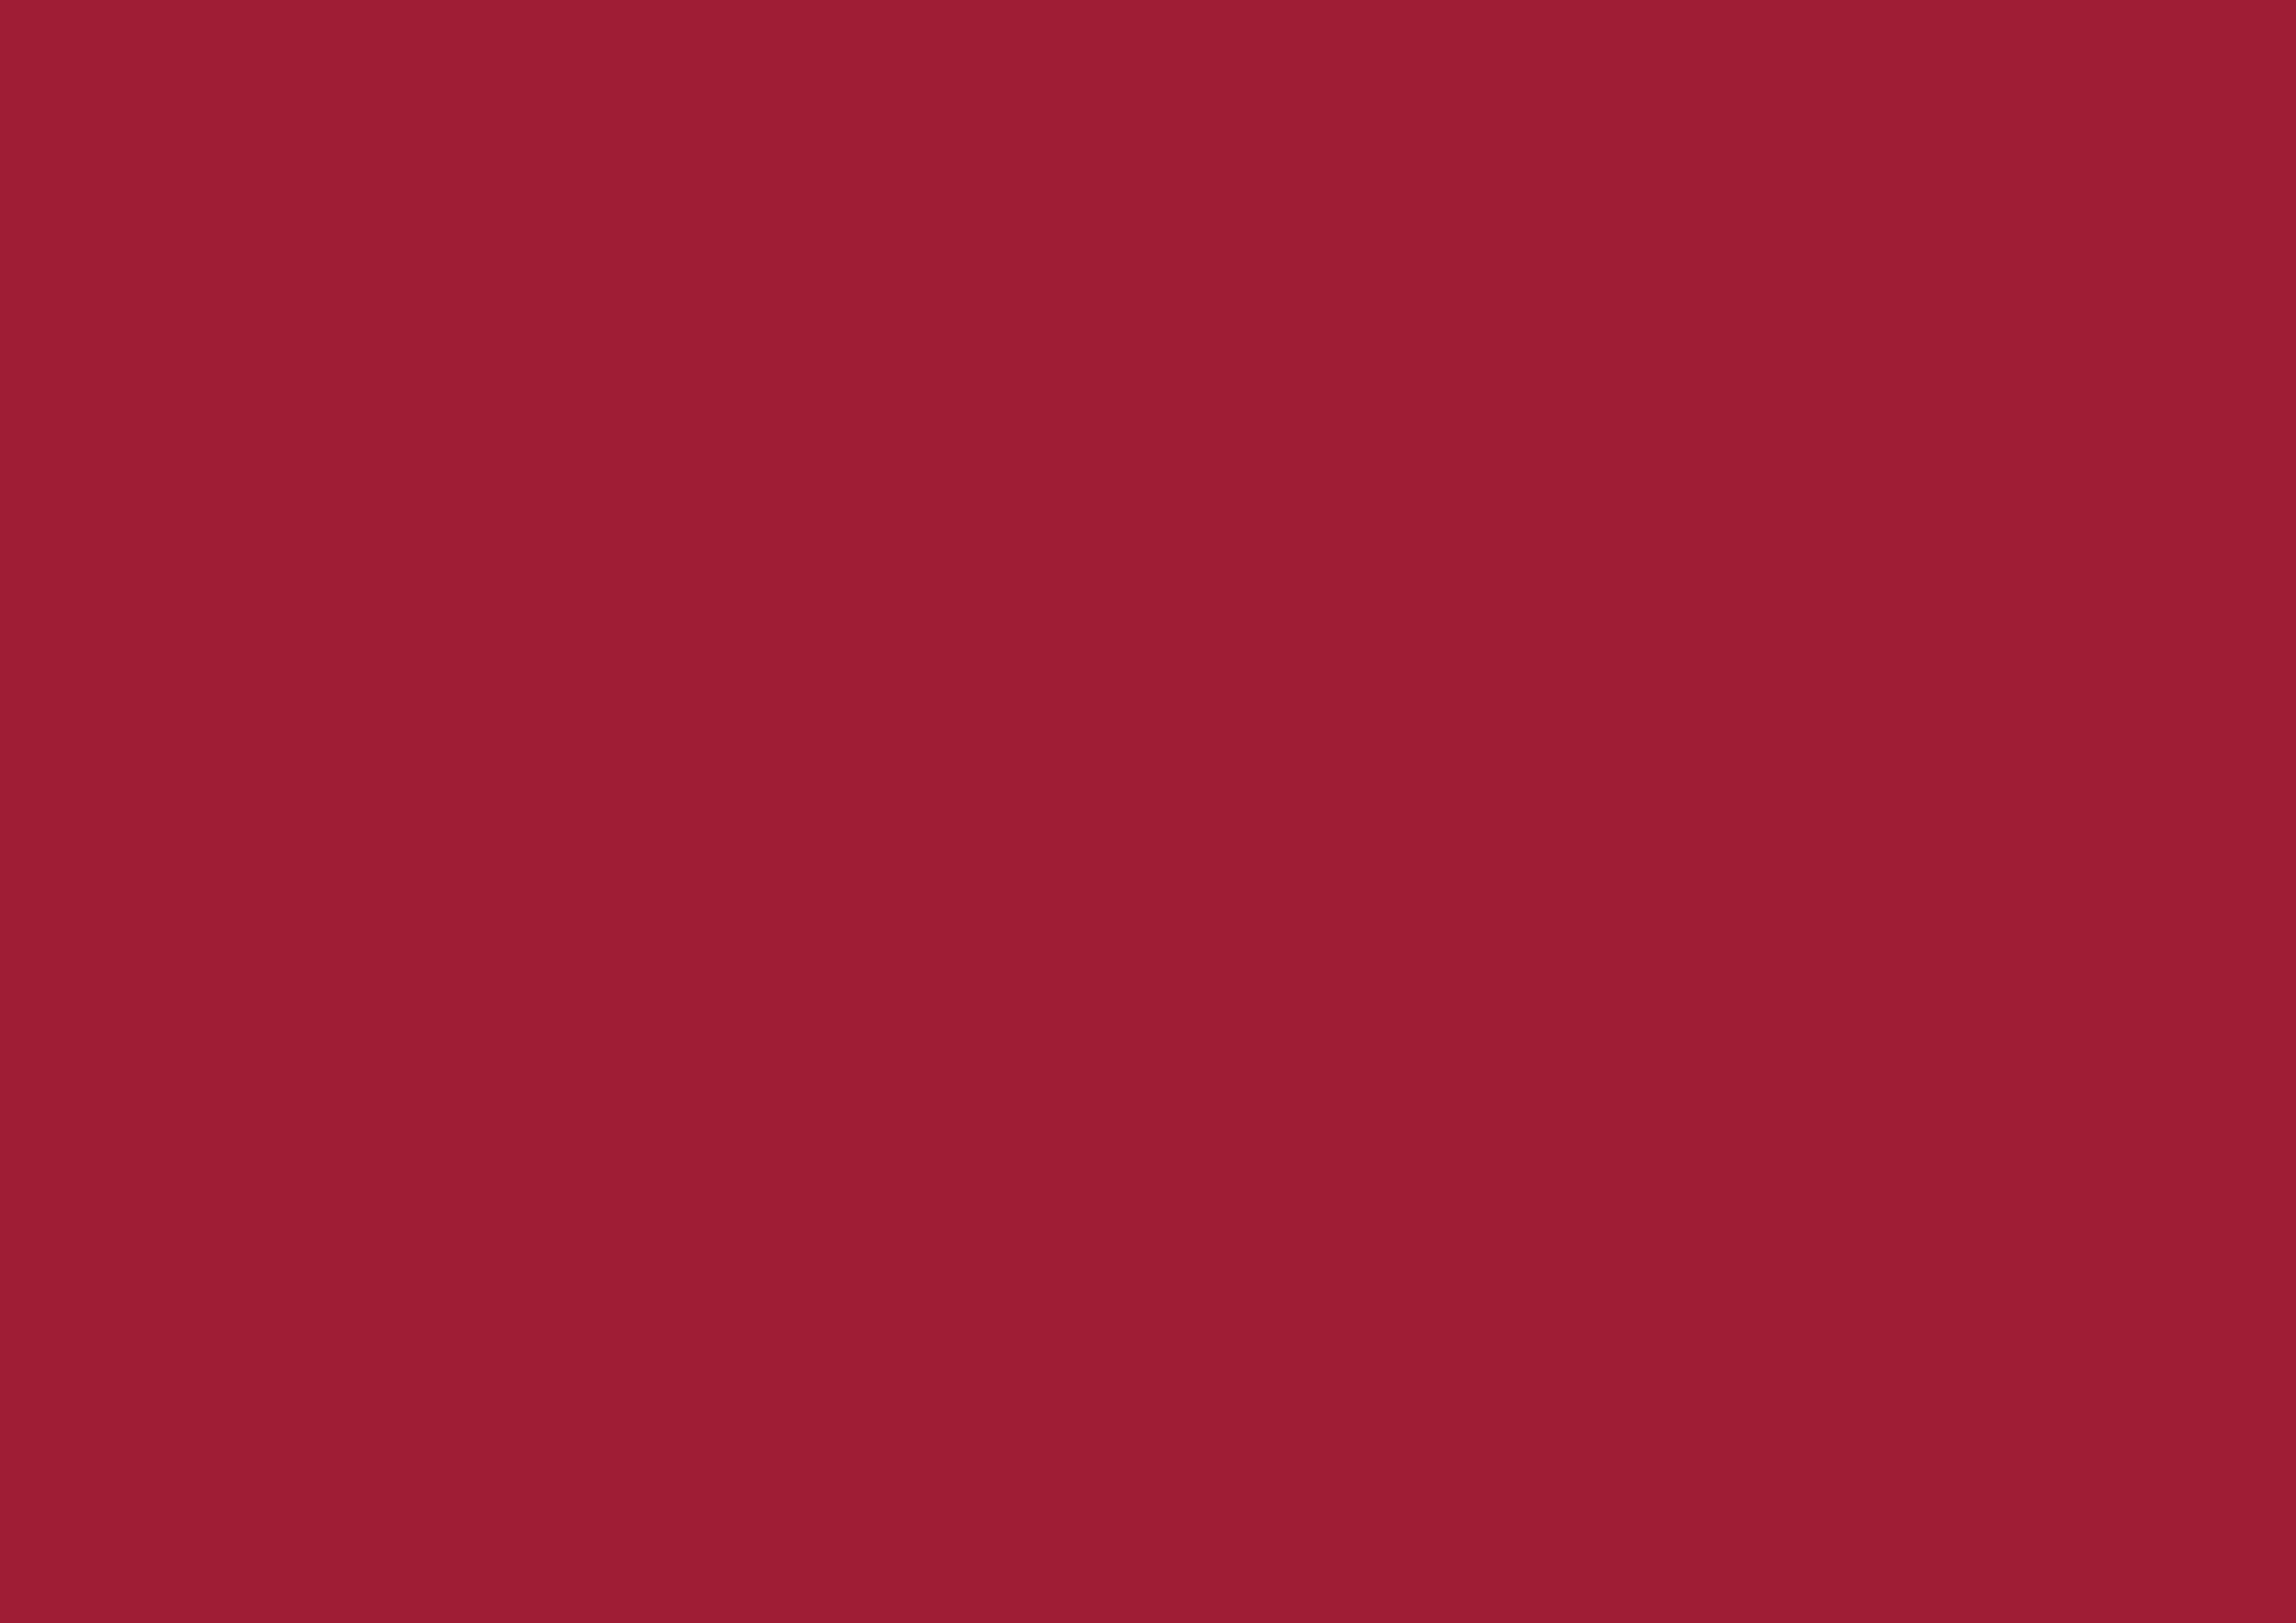 3508x2480 Vivid Burgundy Solid Color Background